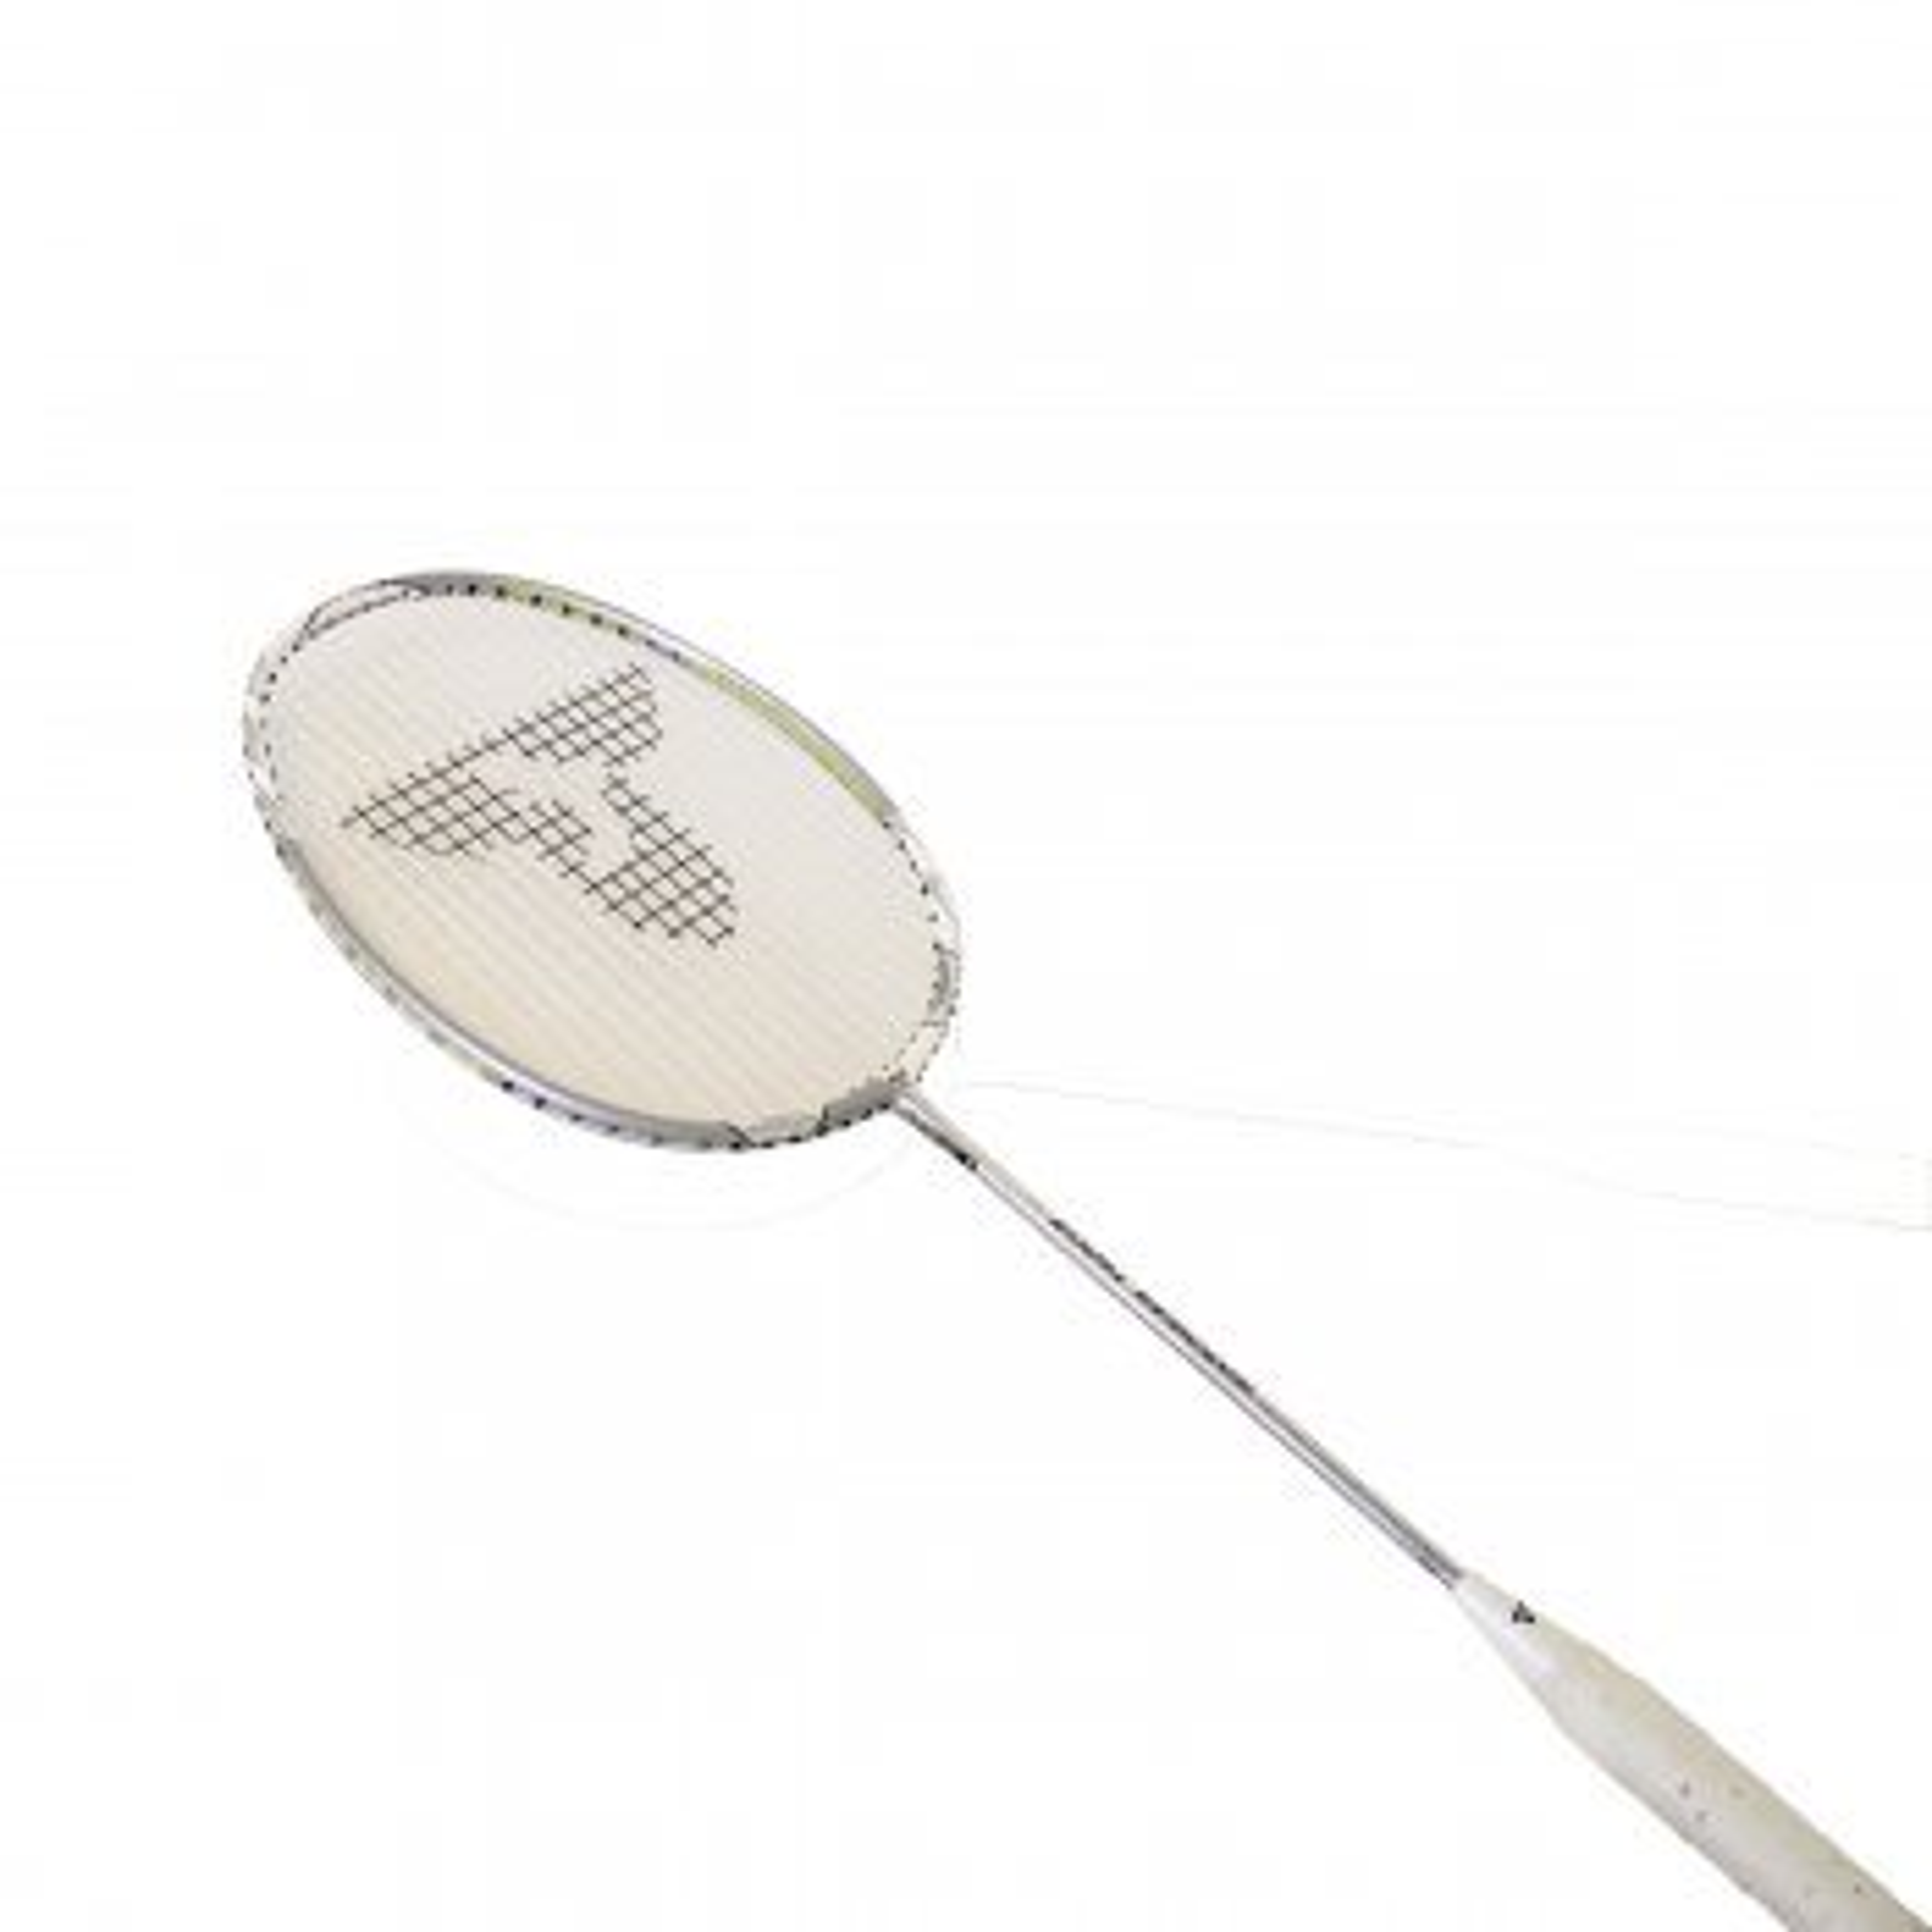 Iso Power T5002 Badminton Racket